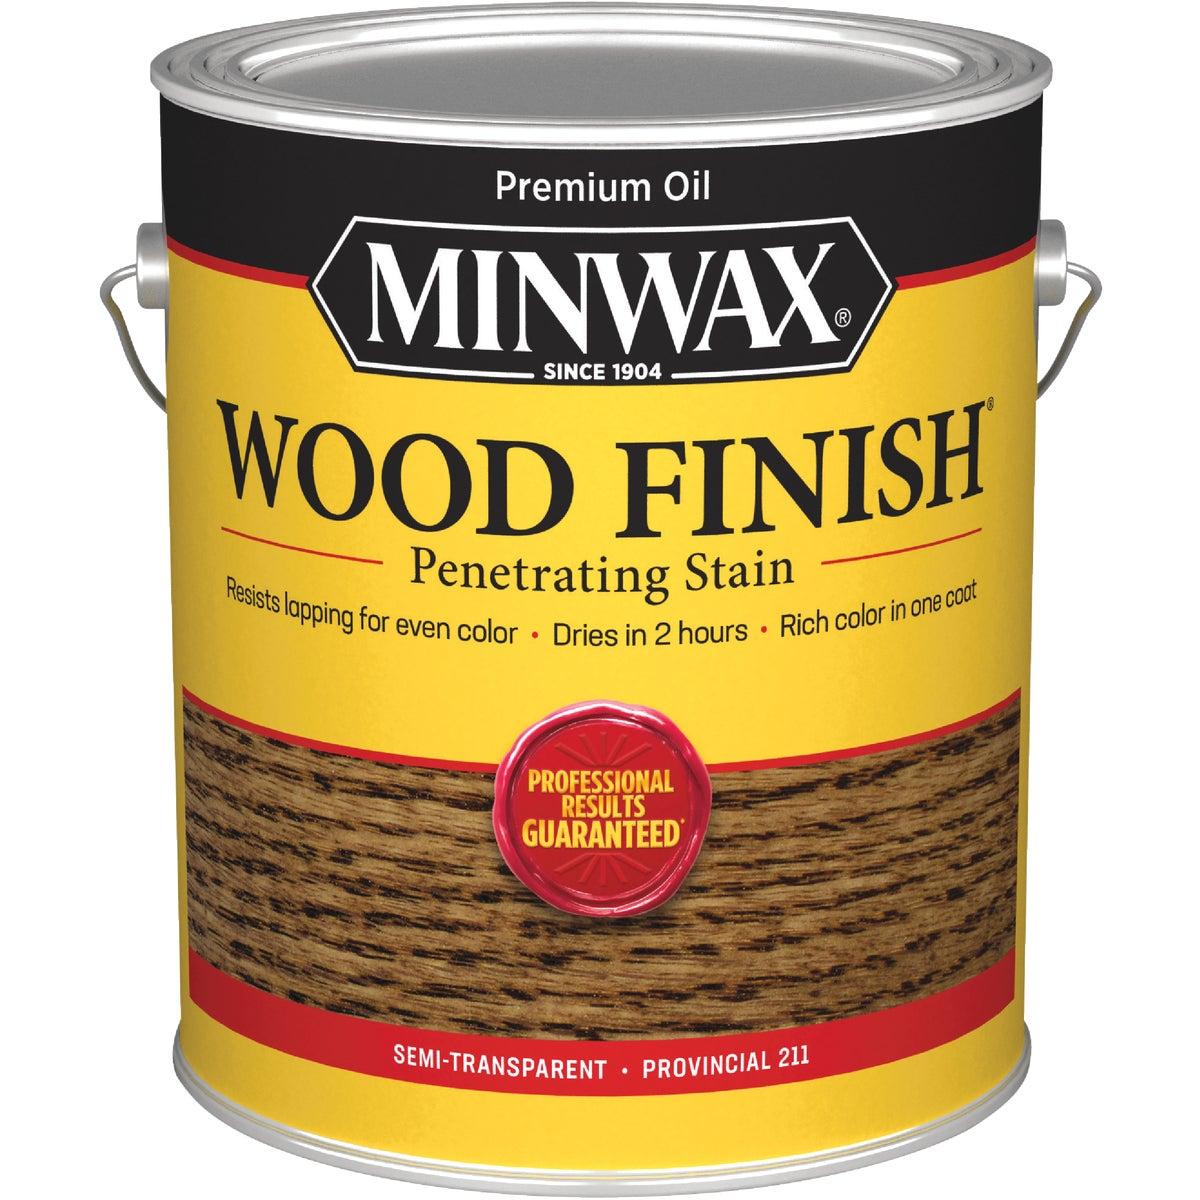 Minwax 71002000 Wood Finish, 1 gallon, Provincial